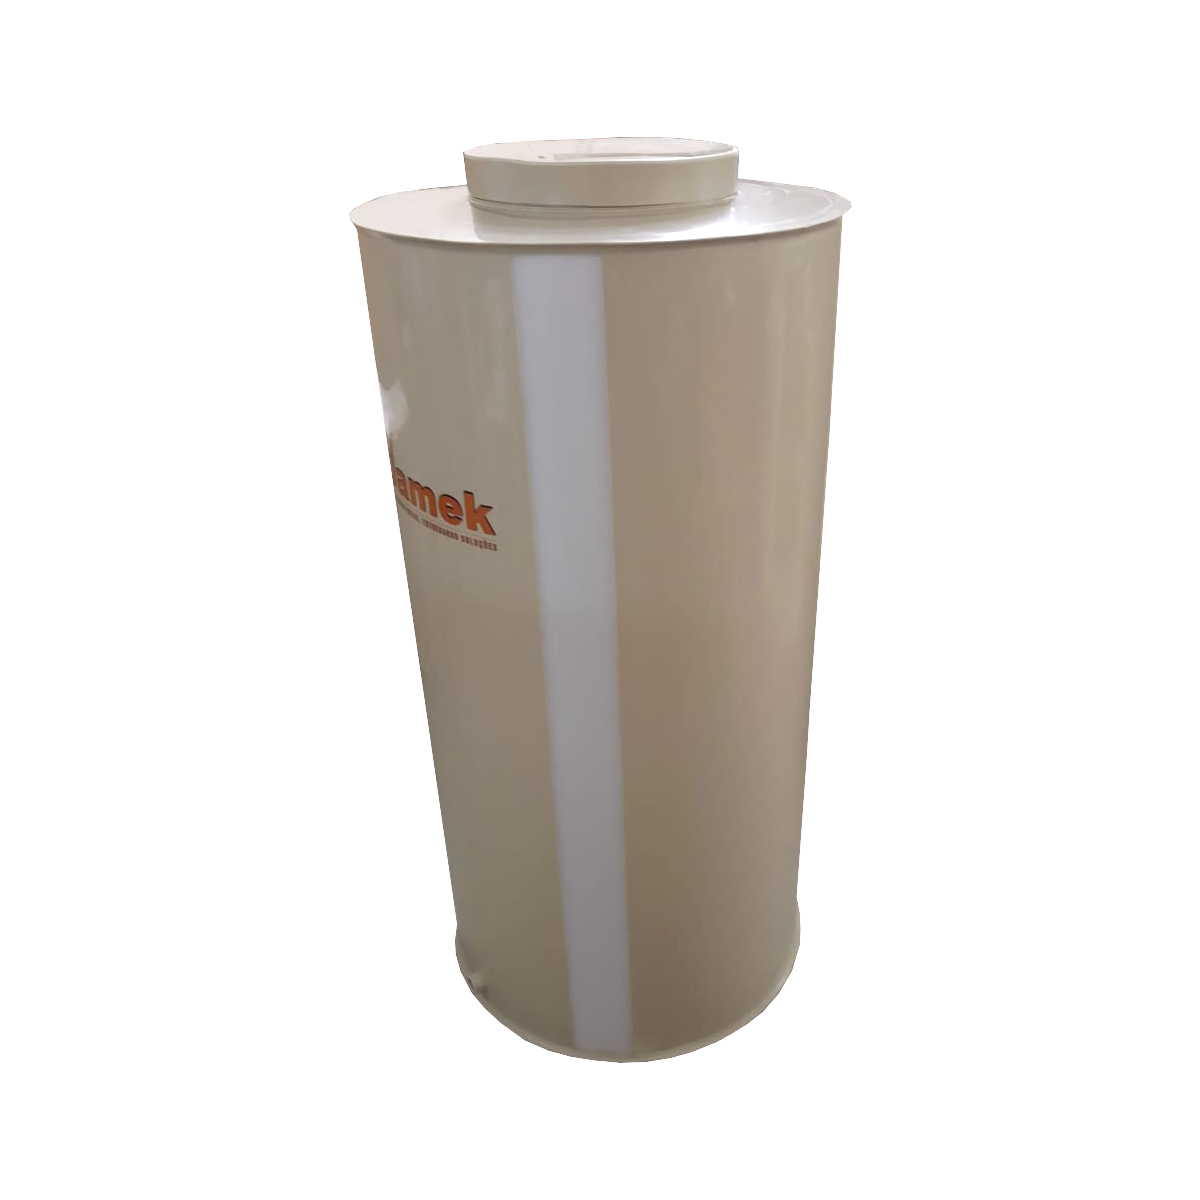 - Reservatório Plástico 80 L / Atóxico / Sem Visor Nível